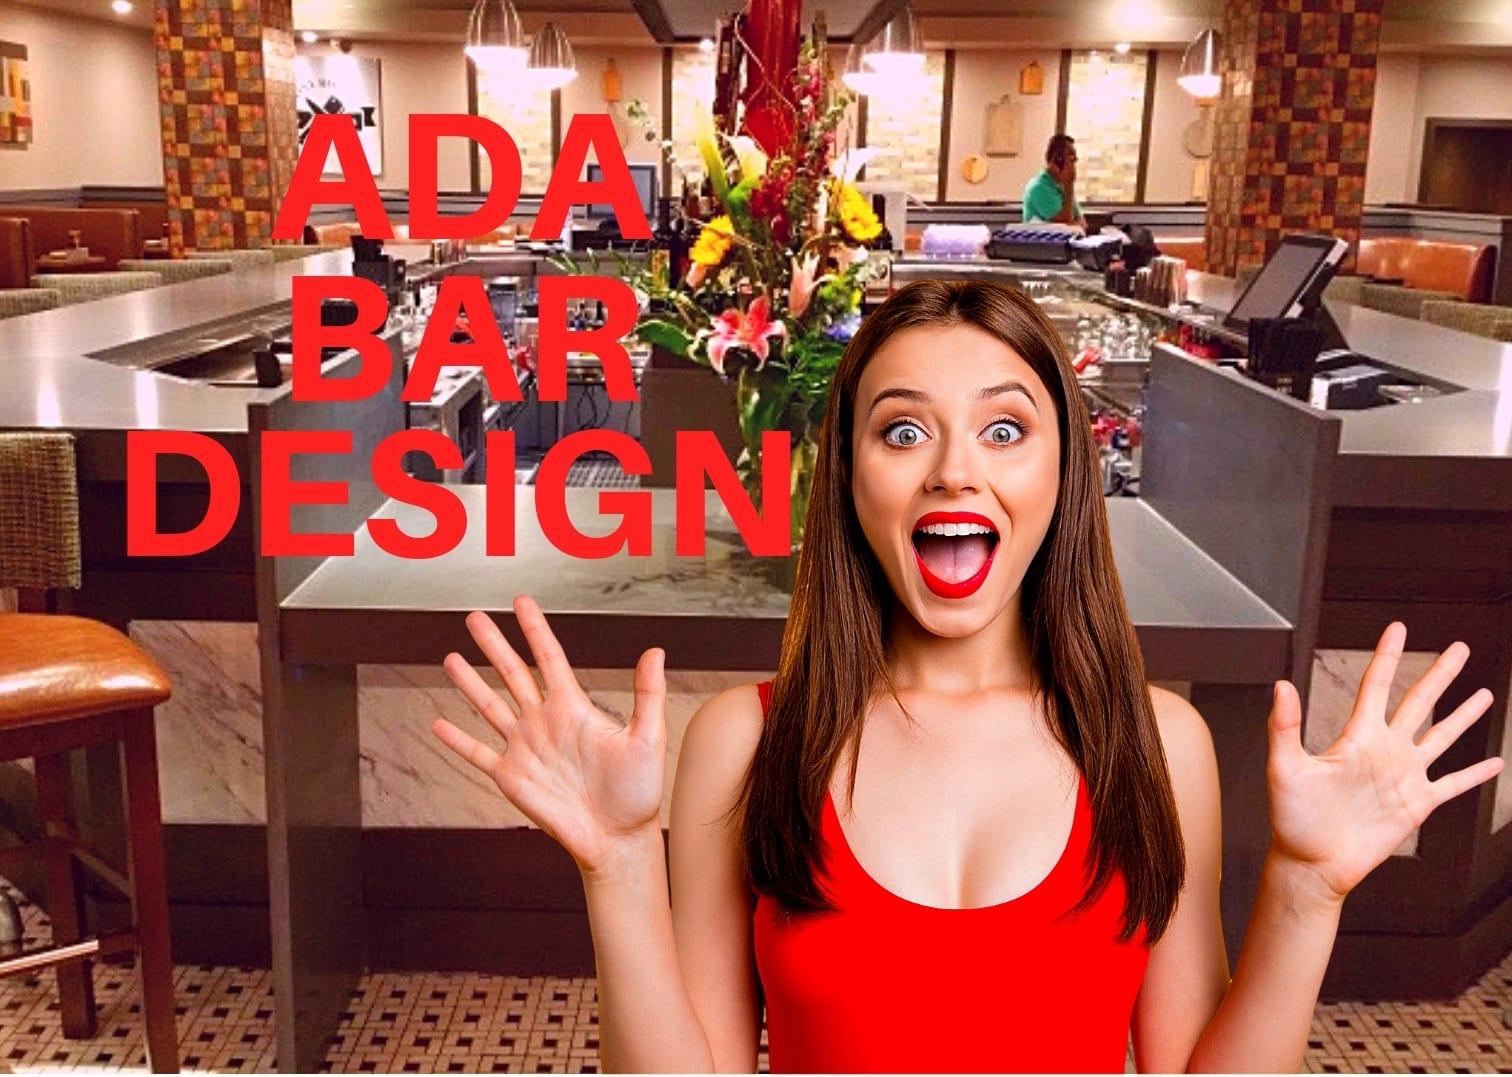 ADA-BAR-DESIGN-IN-5-MINUTES-TN-3